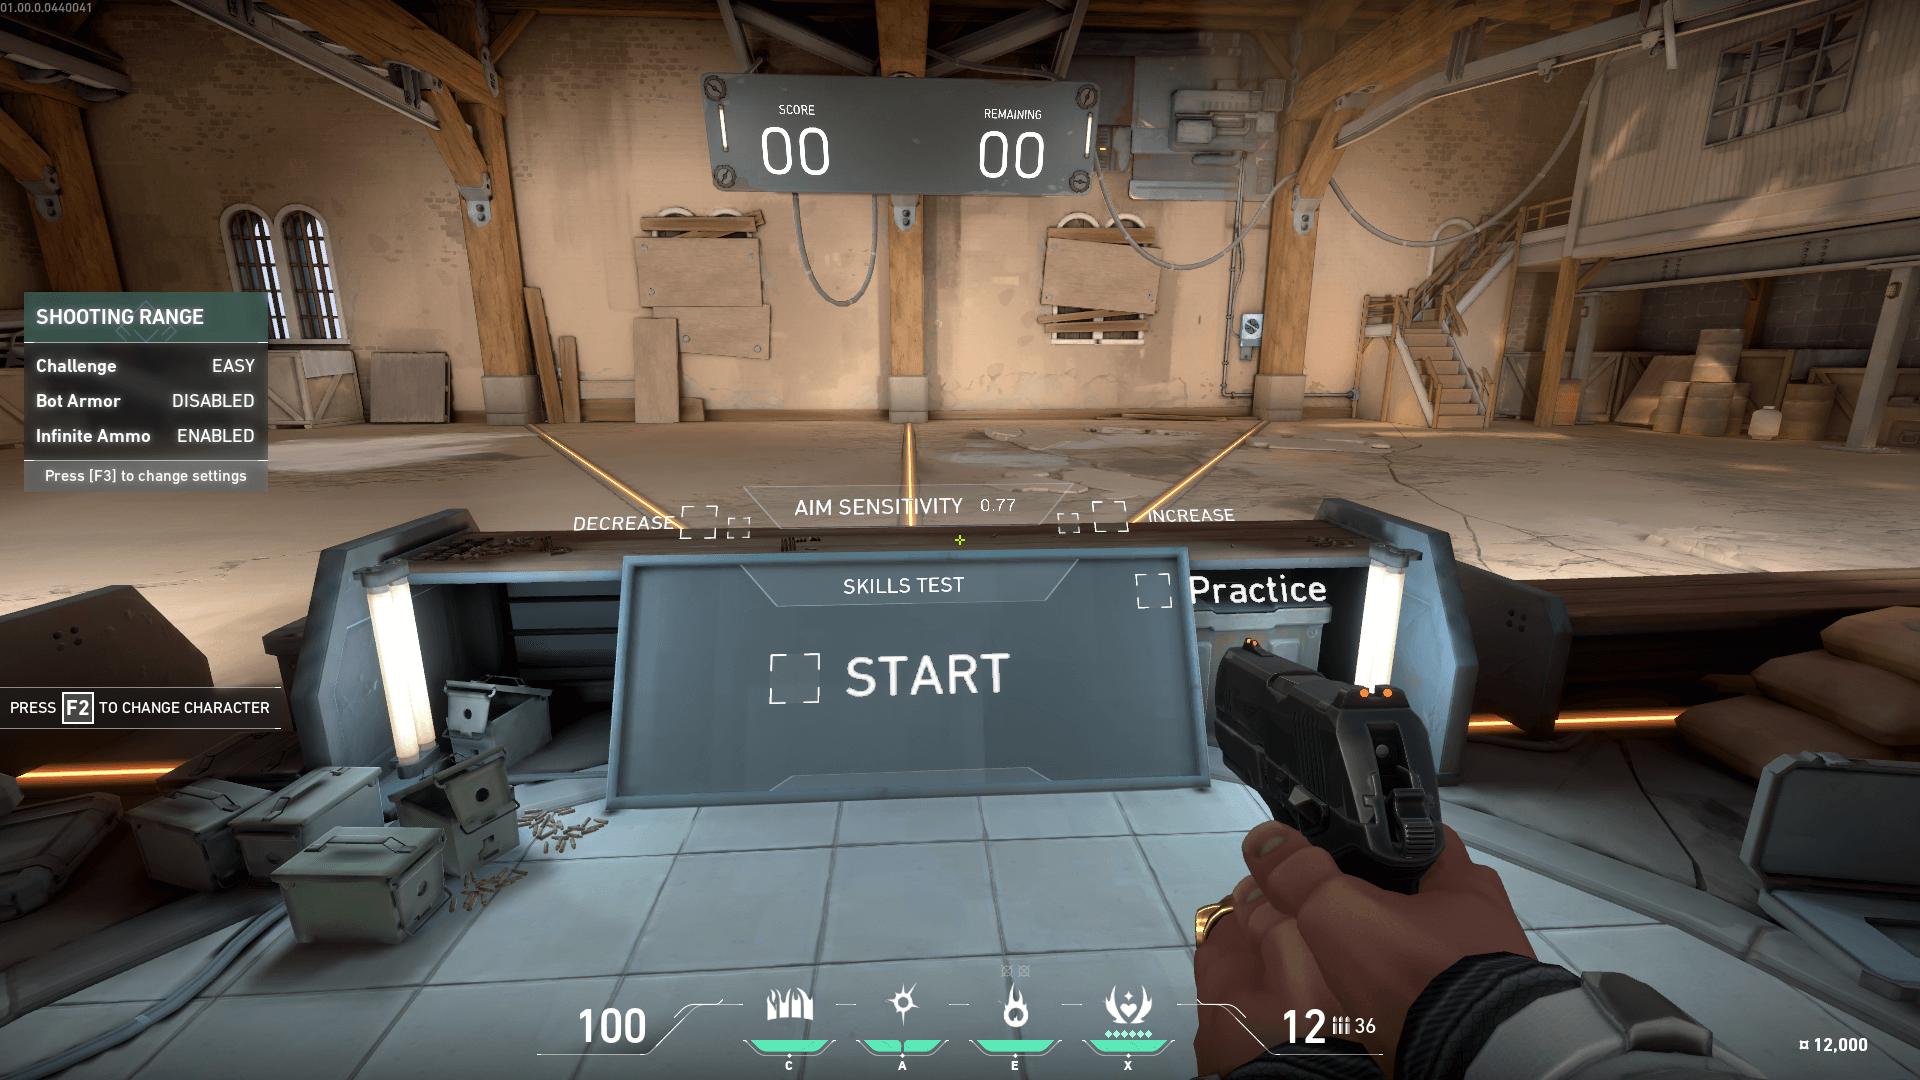 Aim sensitivity screenshot of Valorant video game interface.